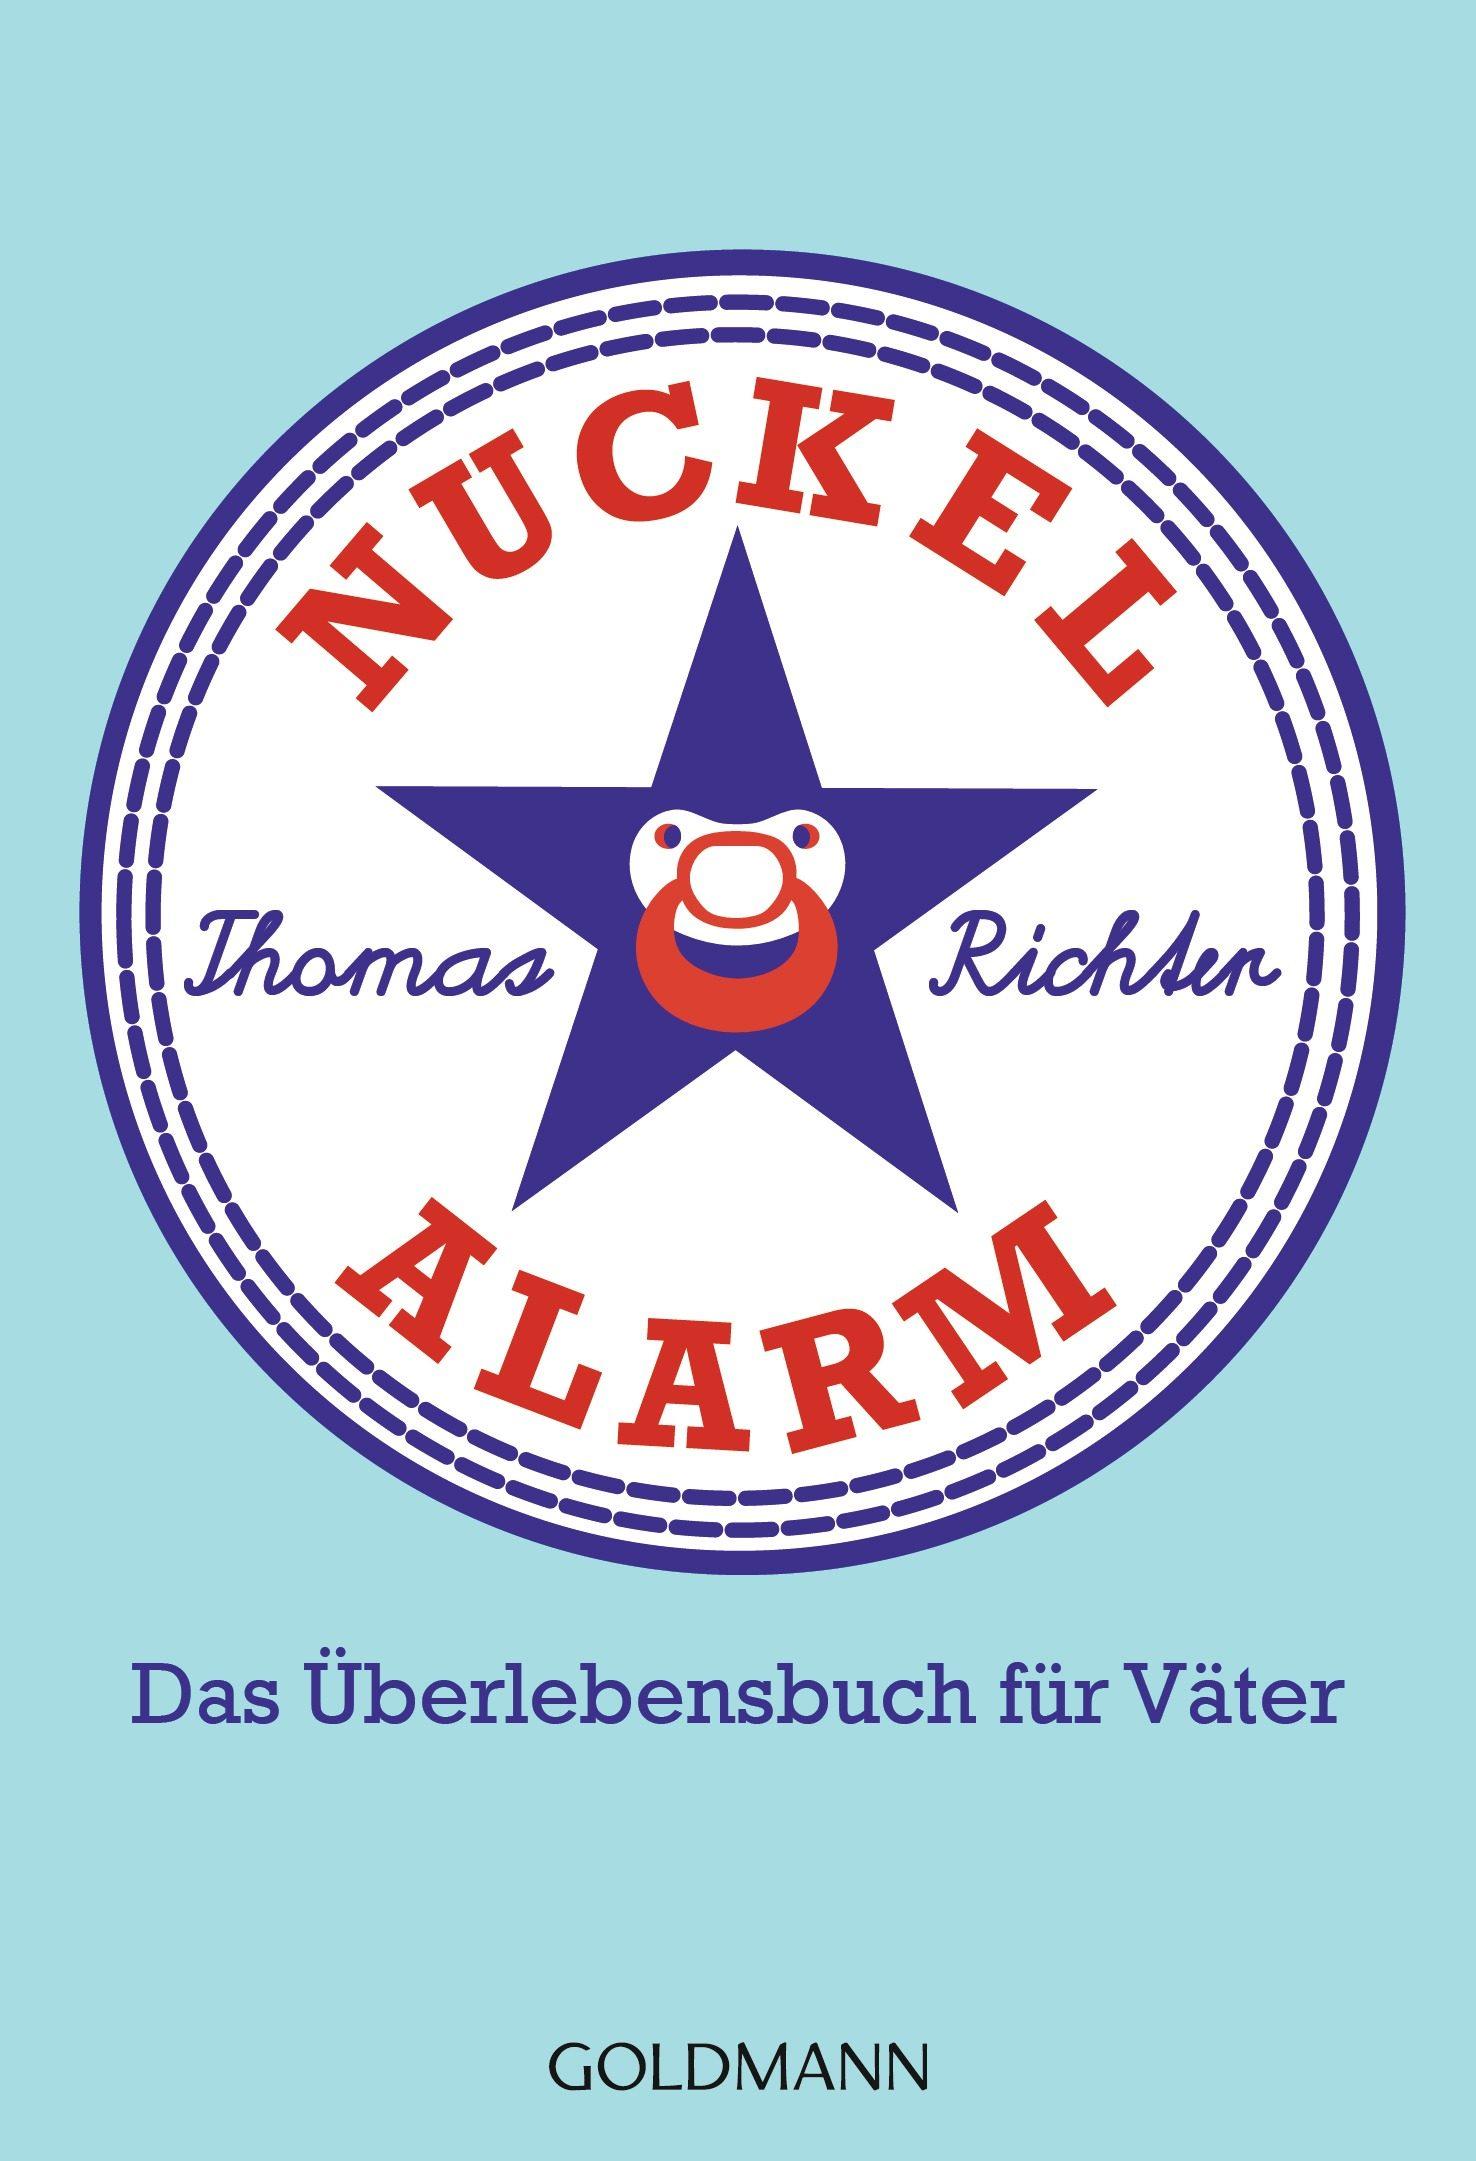 Thomas Richter - Nuckelalarm Cover